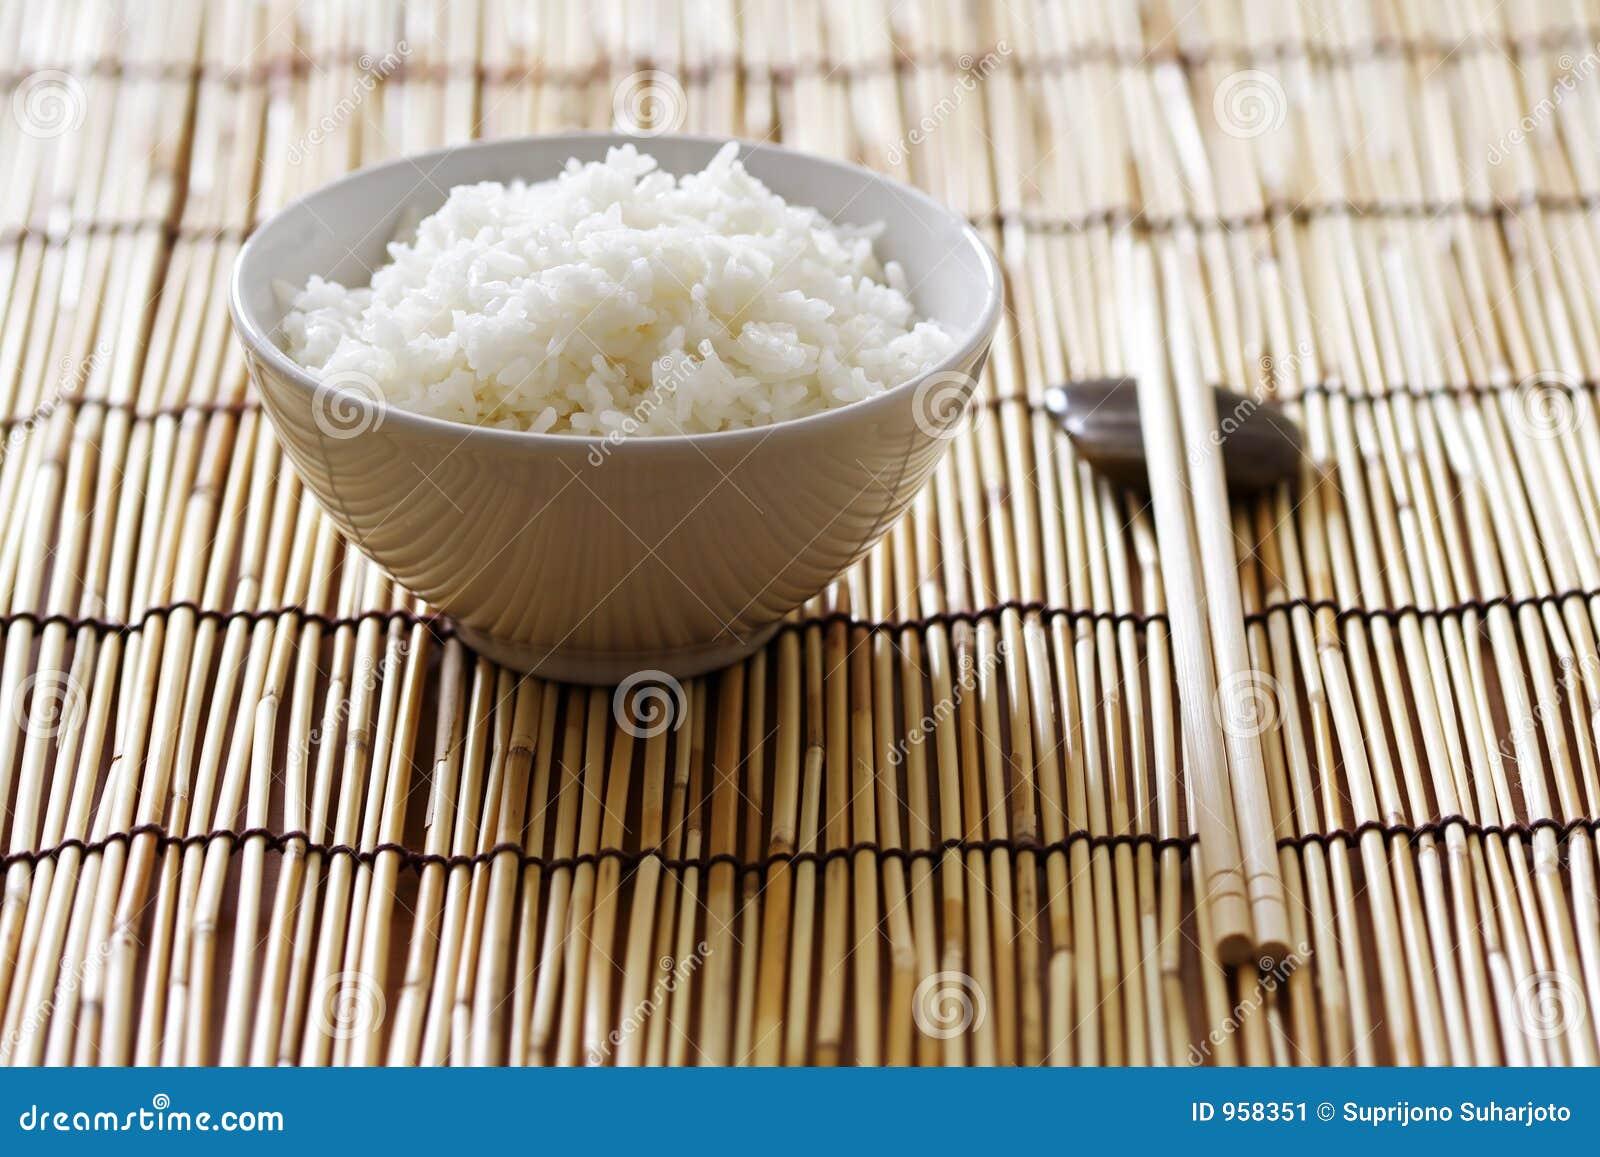 Schüssel Reis